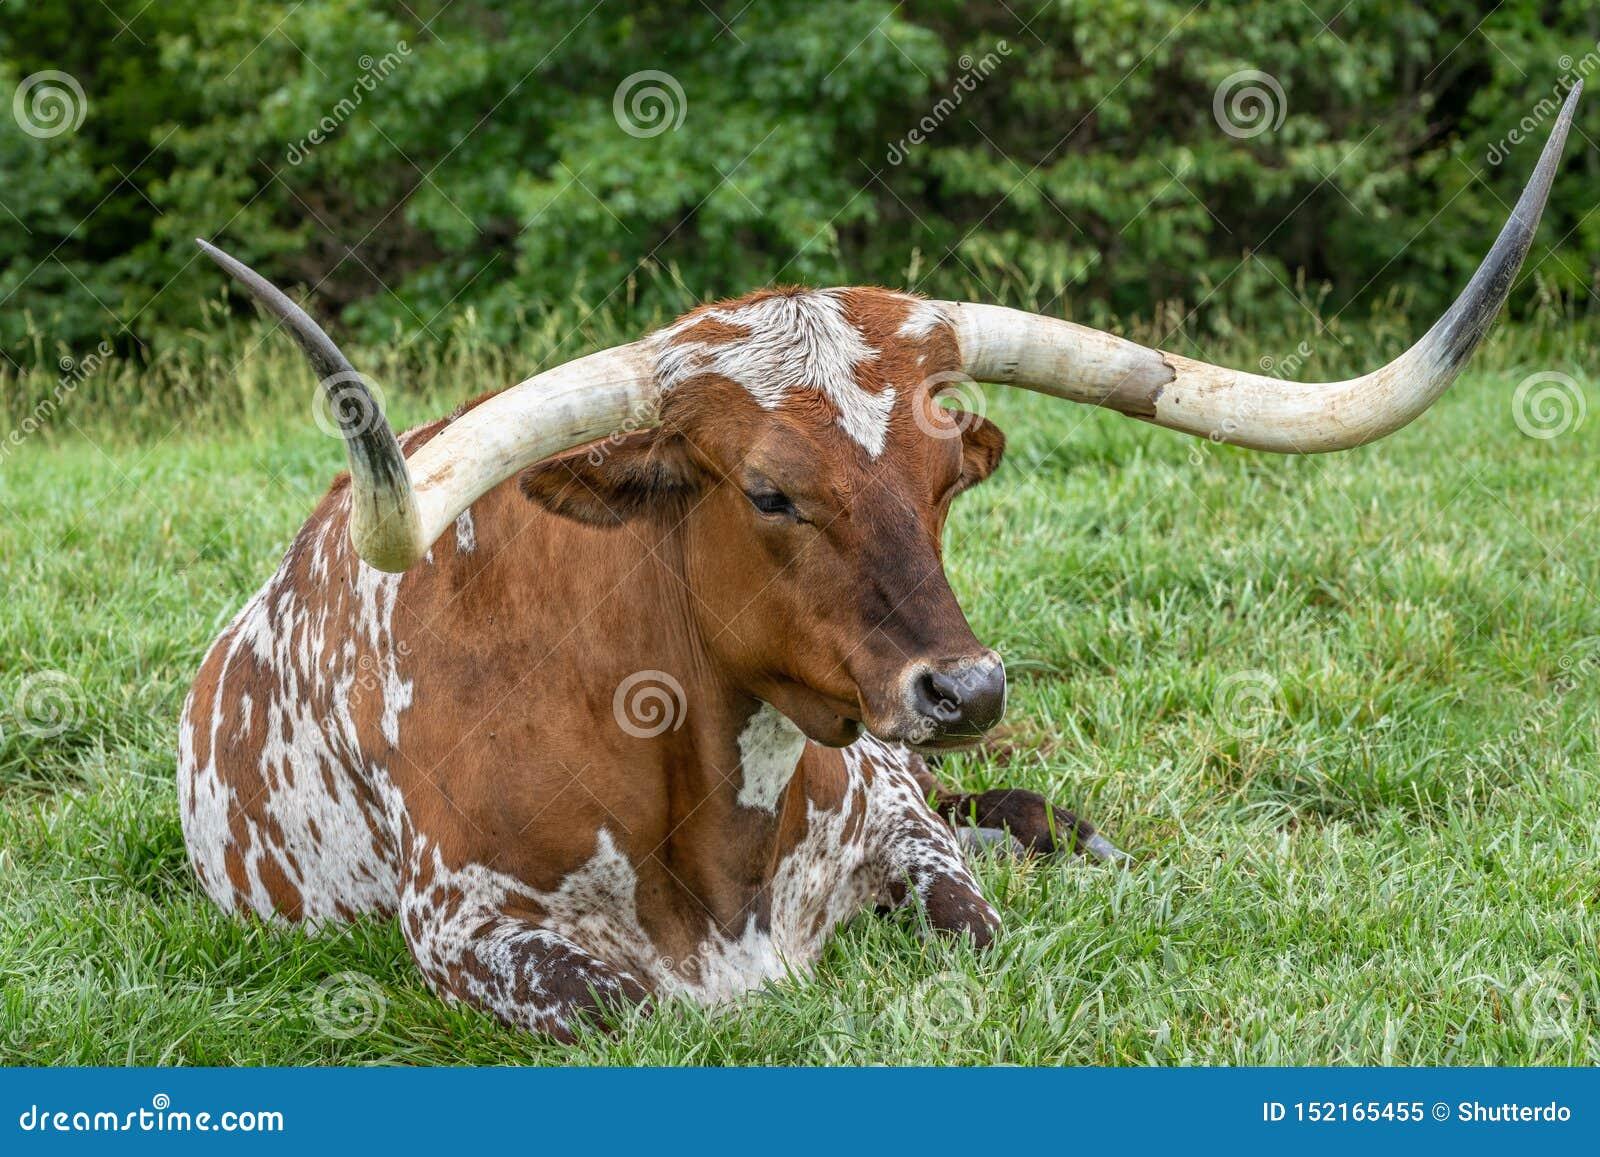 Huge close up of a Texas long horn steer